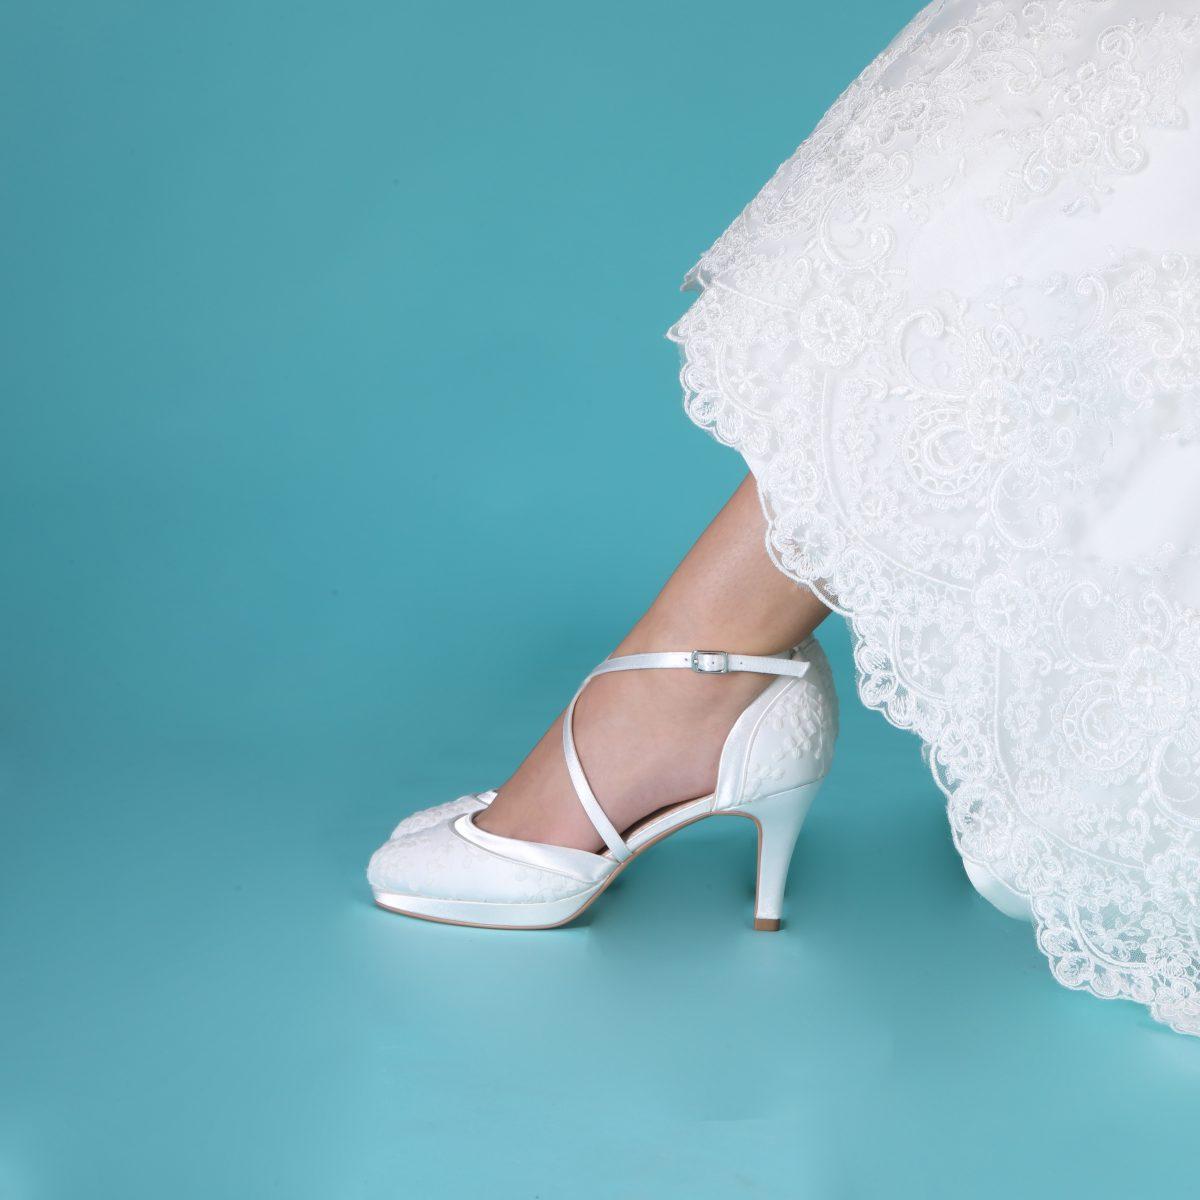 Perfect Bridal Isobel Shoes - Ivory Lace 2